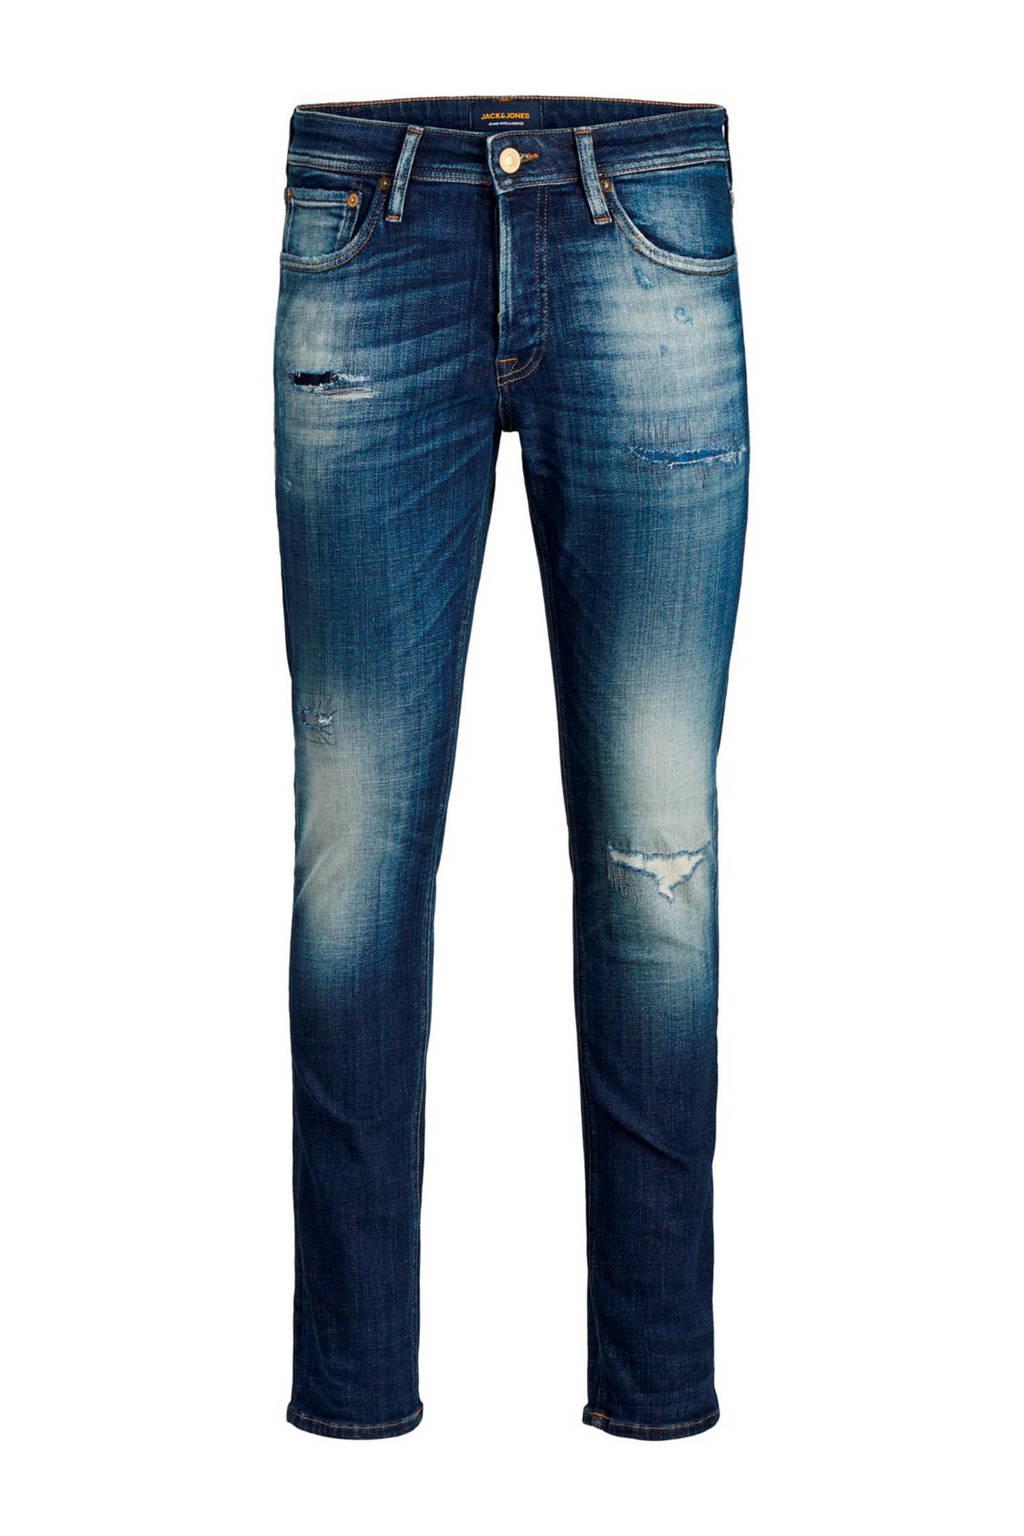 JACK & JONES JEANS INTELLIGENCE slim fit jeans Glenn blue denim, 164 Blue Denim